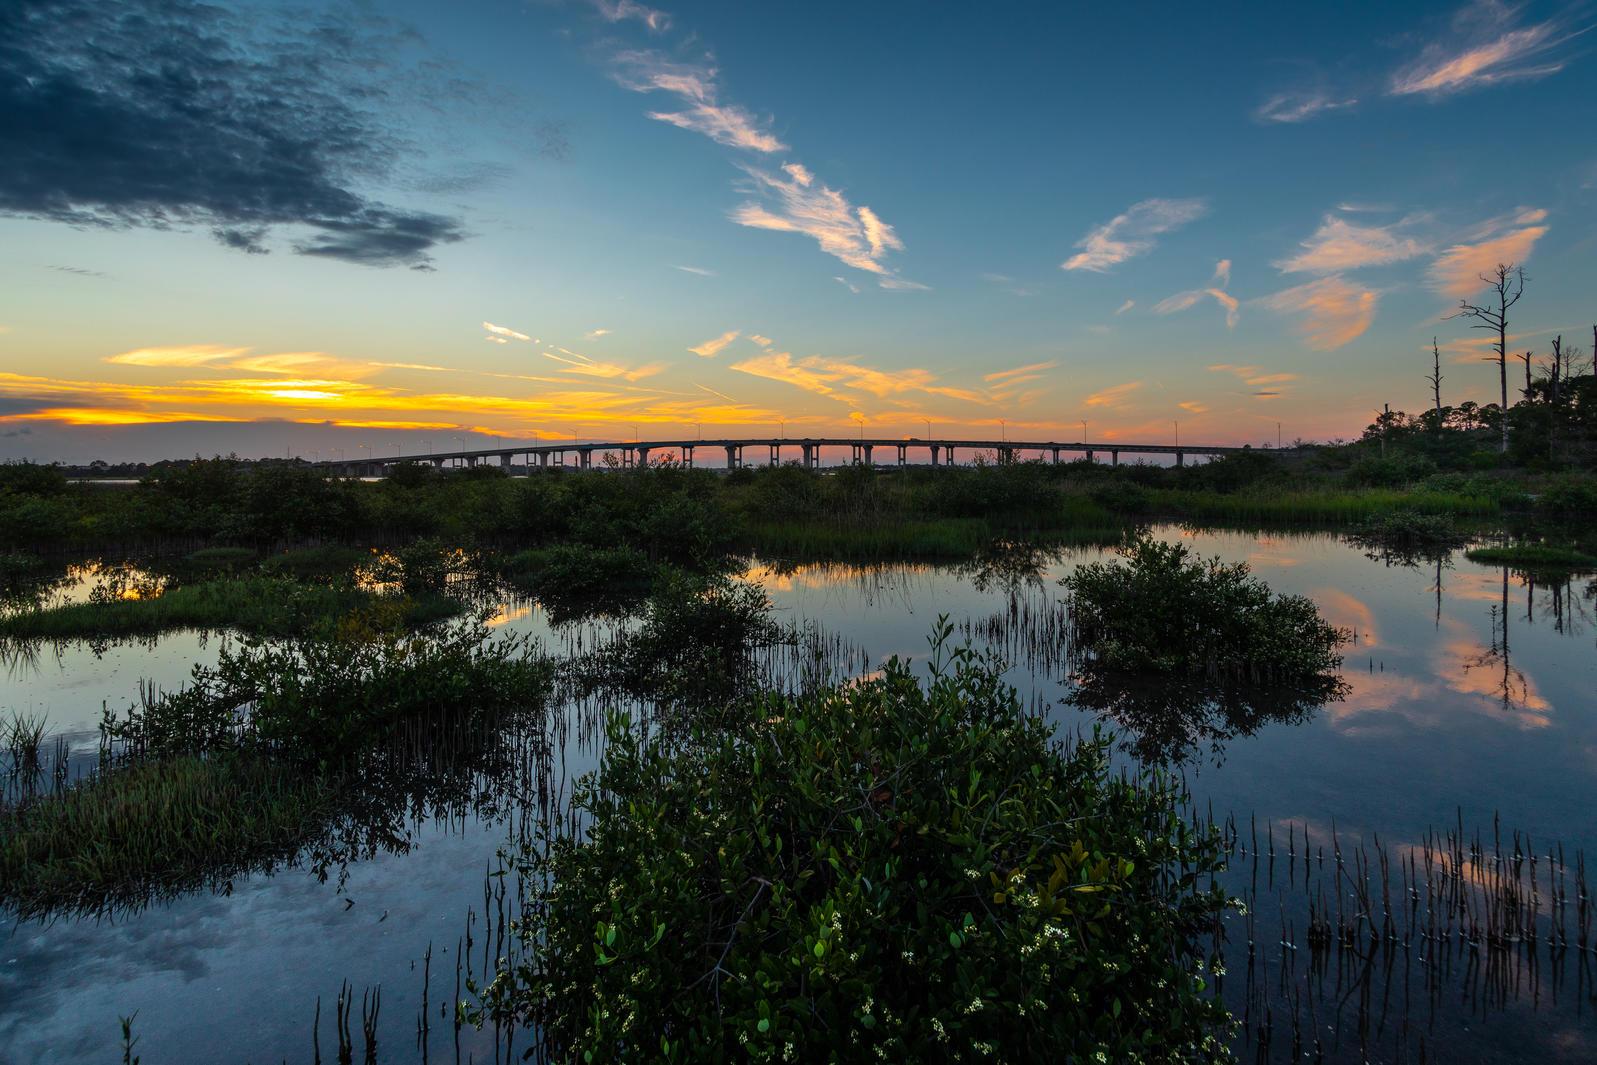 Fish Island. Photo: Monarch Studio, Scott S. Smith